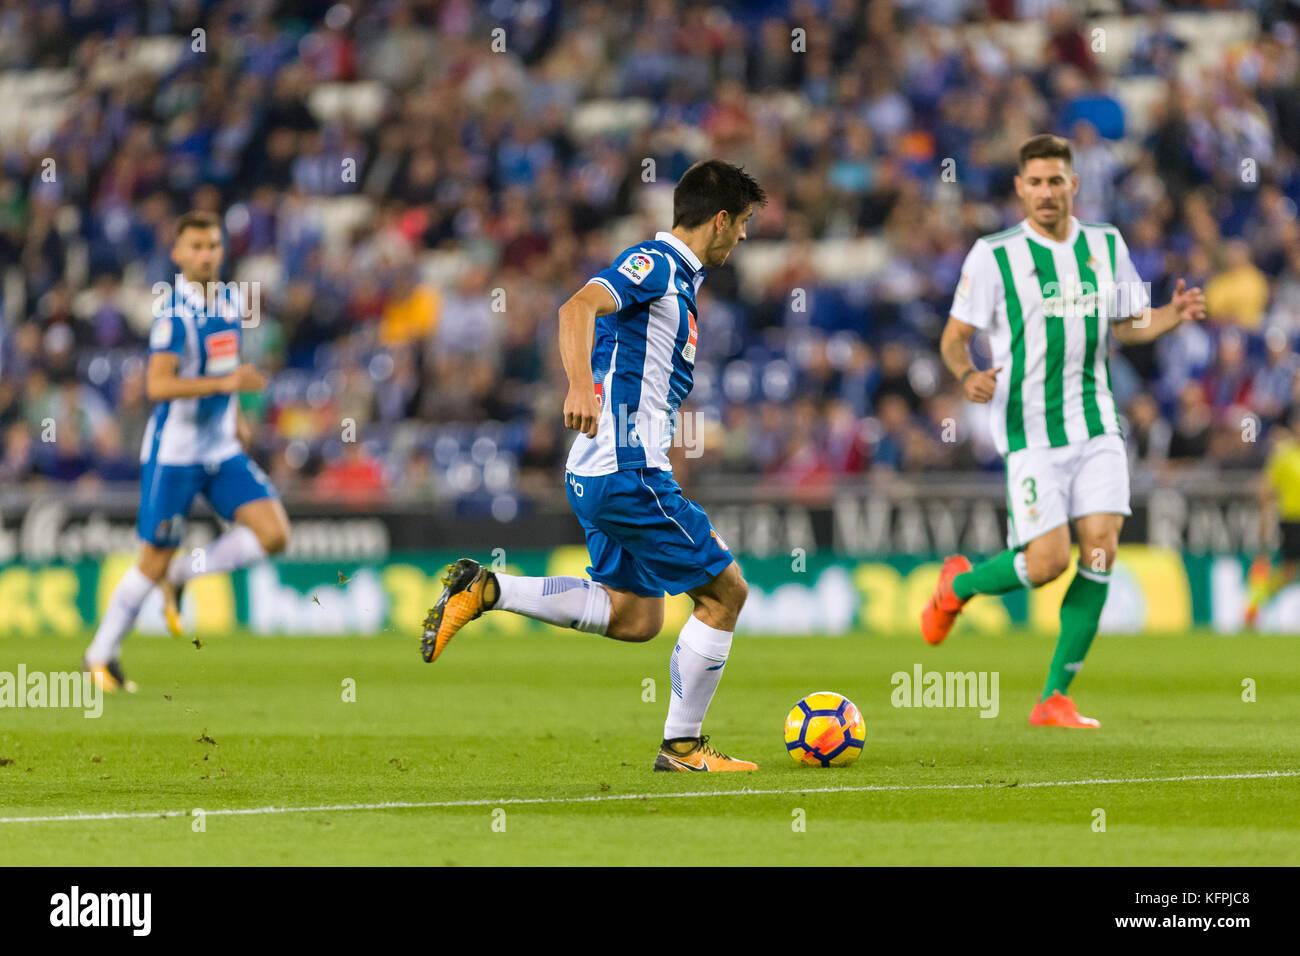 Barcelona, Spain. 30th Oct, 2017. RCD Espanyol forward Gerard Moreno (7) during the match between RCD Espanyol against - Stock Image